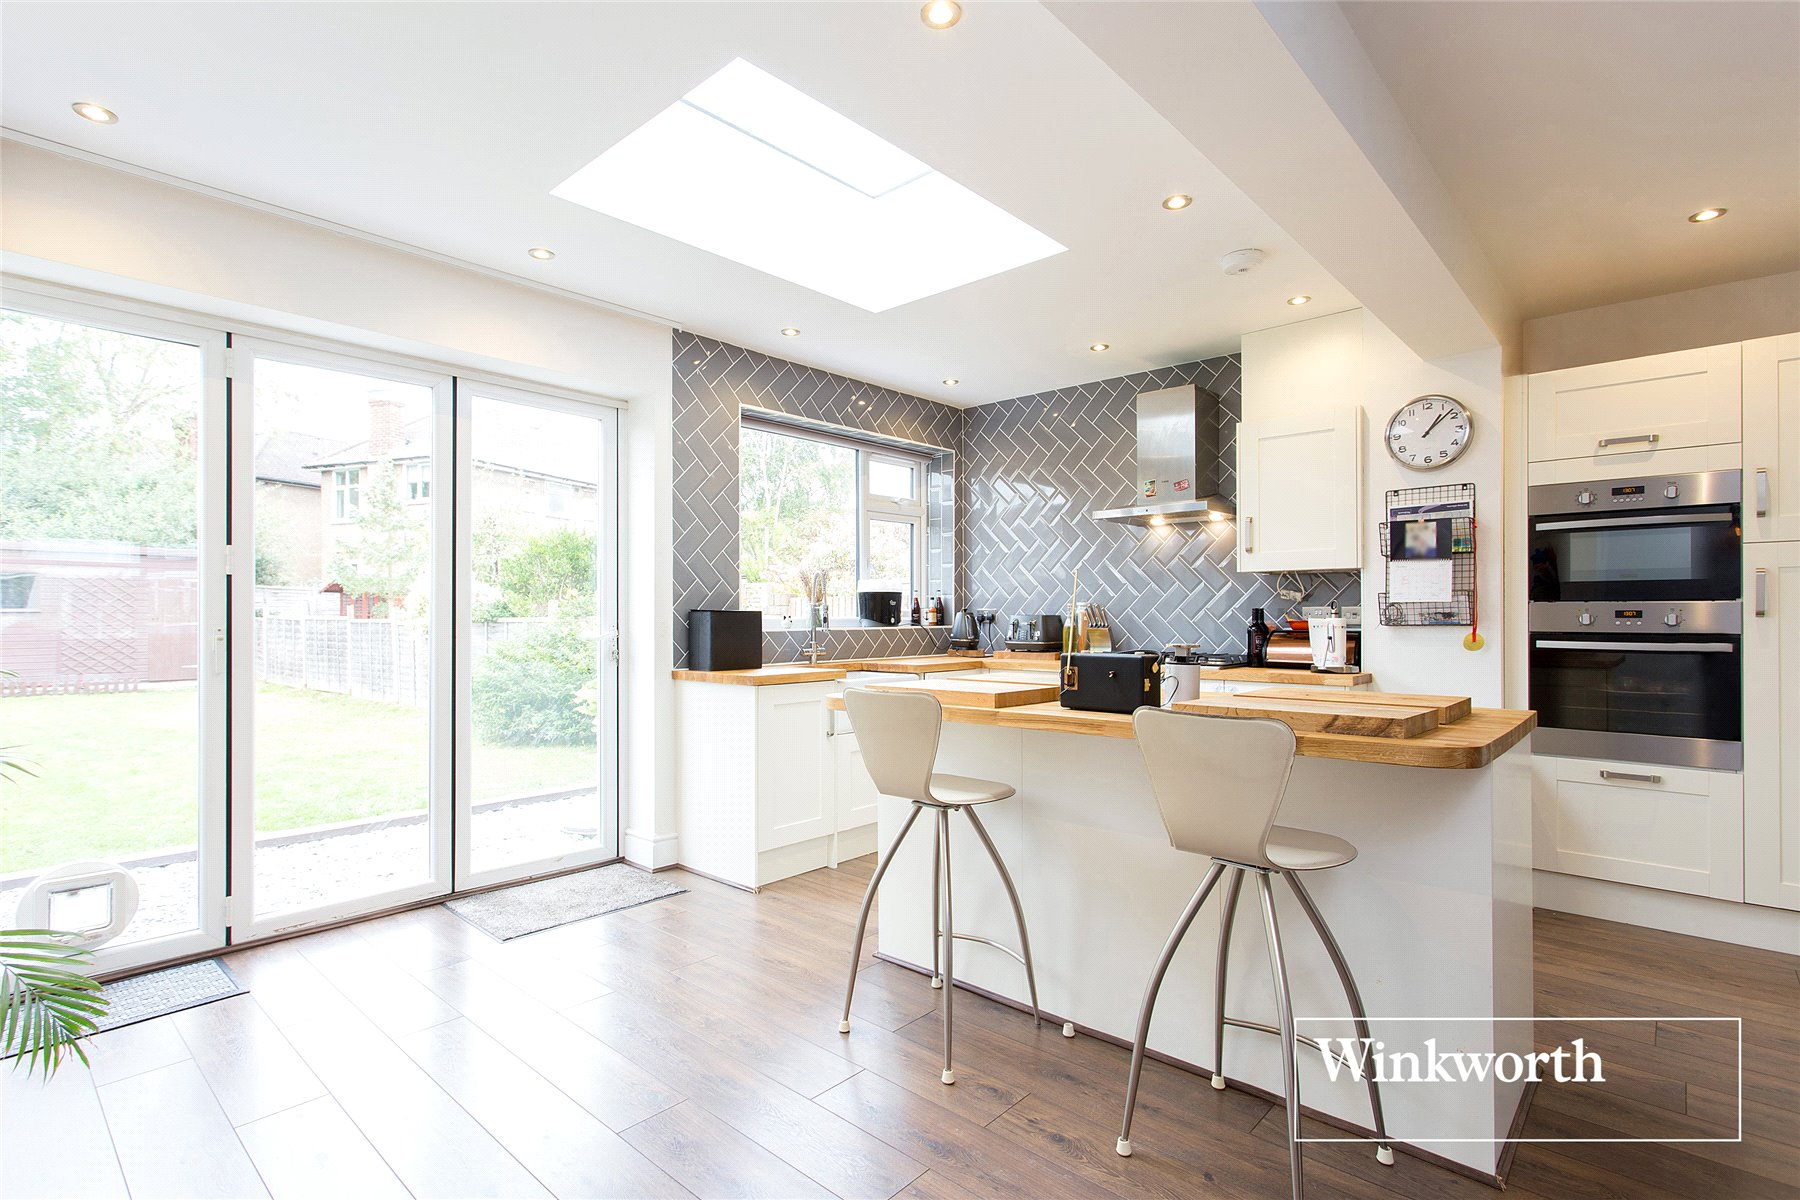 4 bedroom property for sale in Alan Drive, Barnet, Herts, EN5 - £640,000